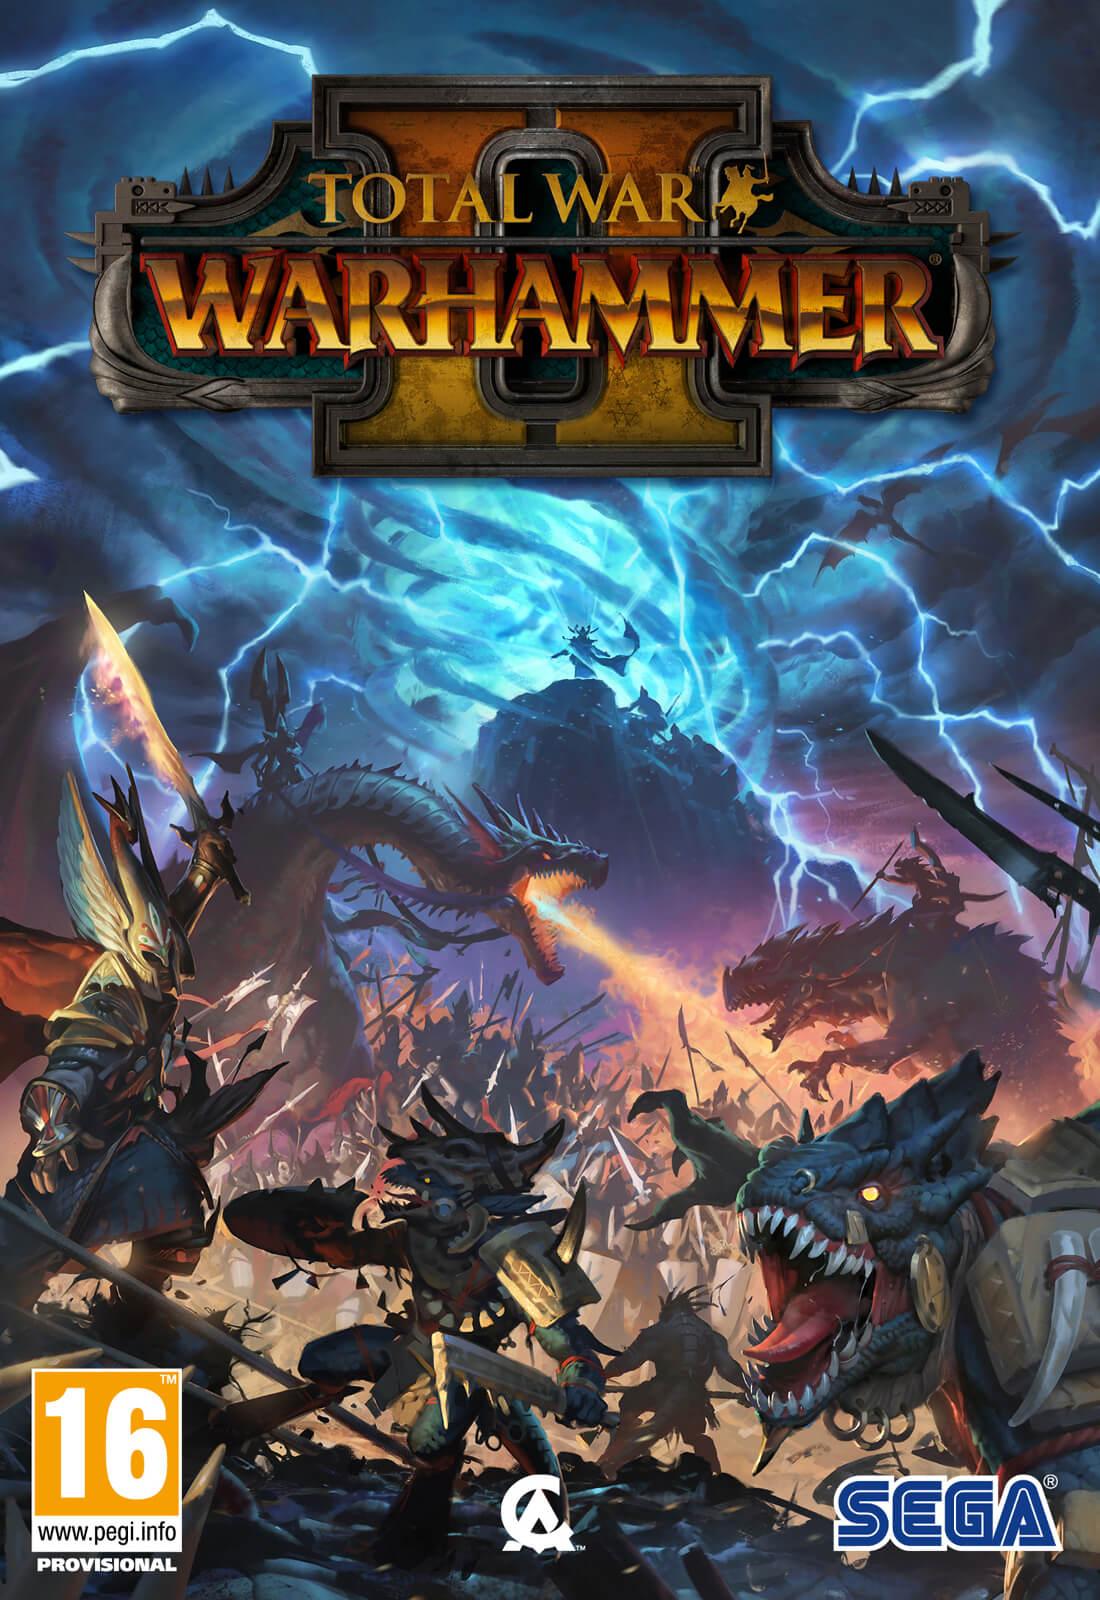 Total War: Warhammer 2 pc dvd-ის სურათის შედეგი